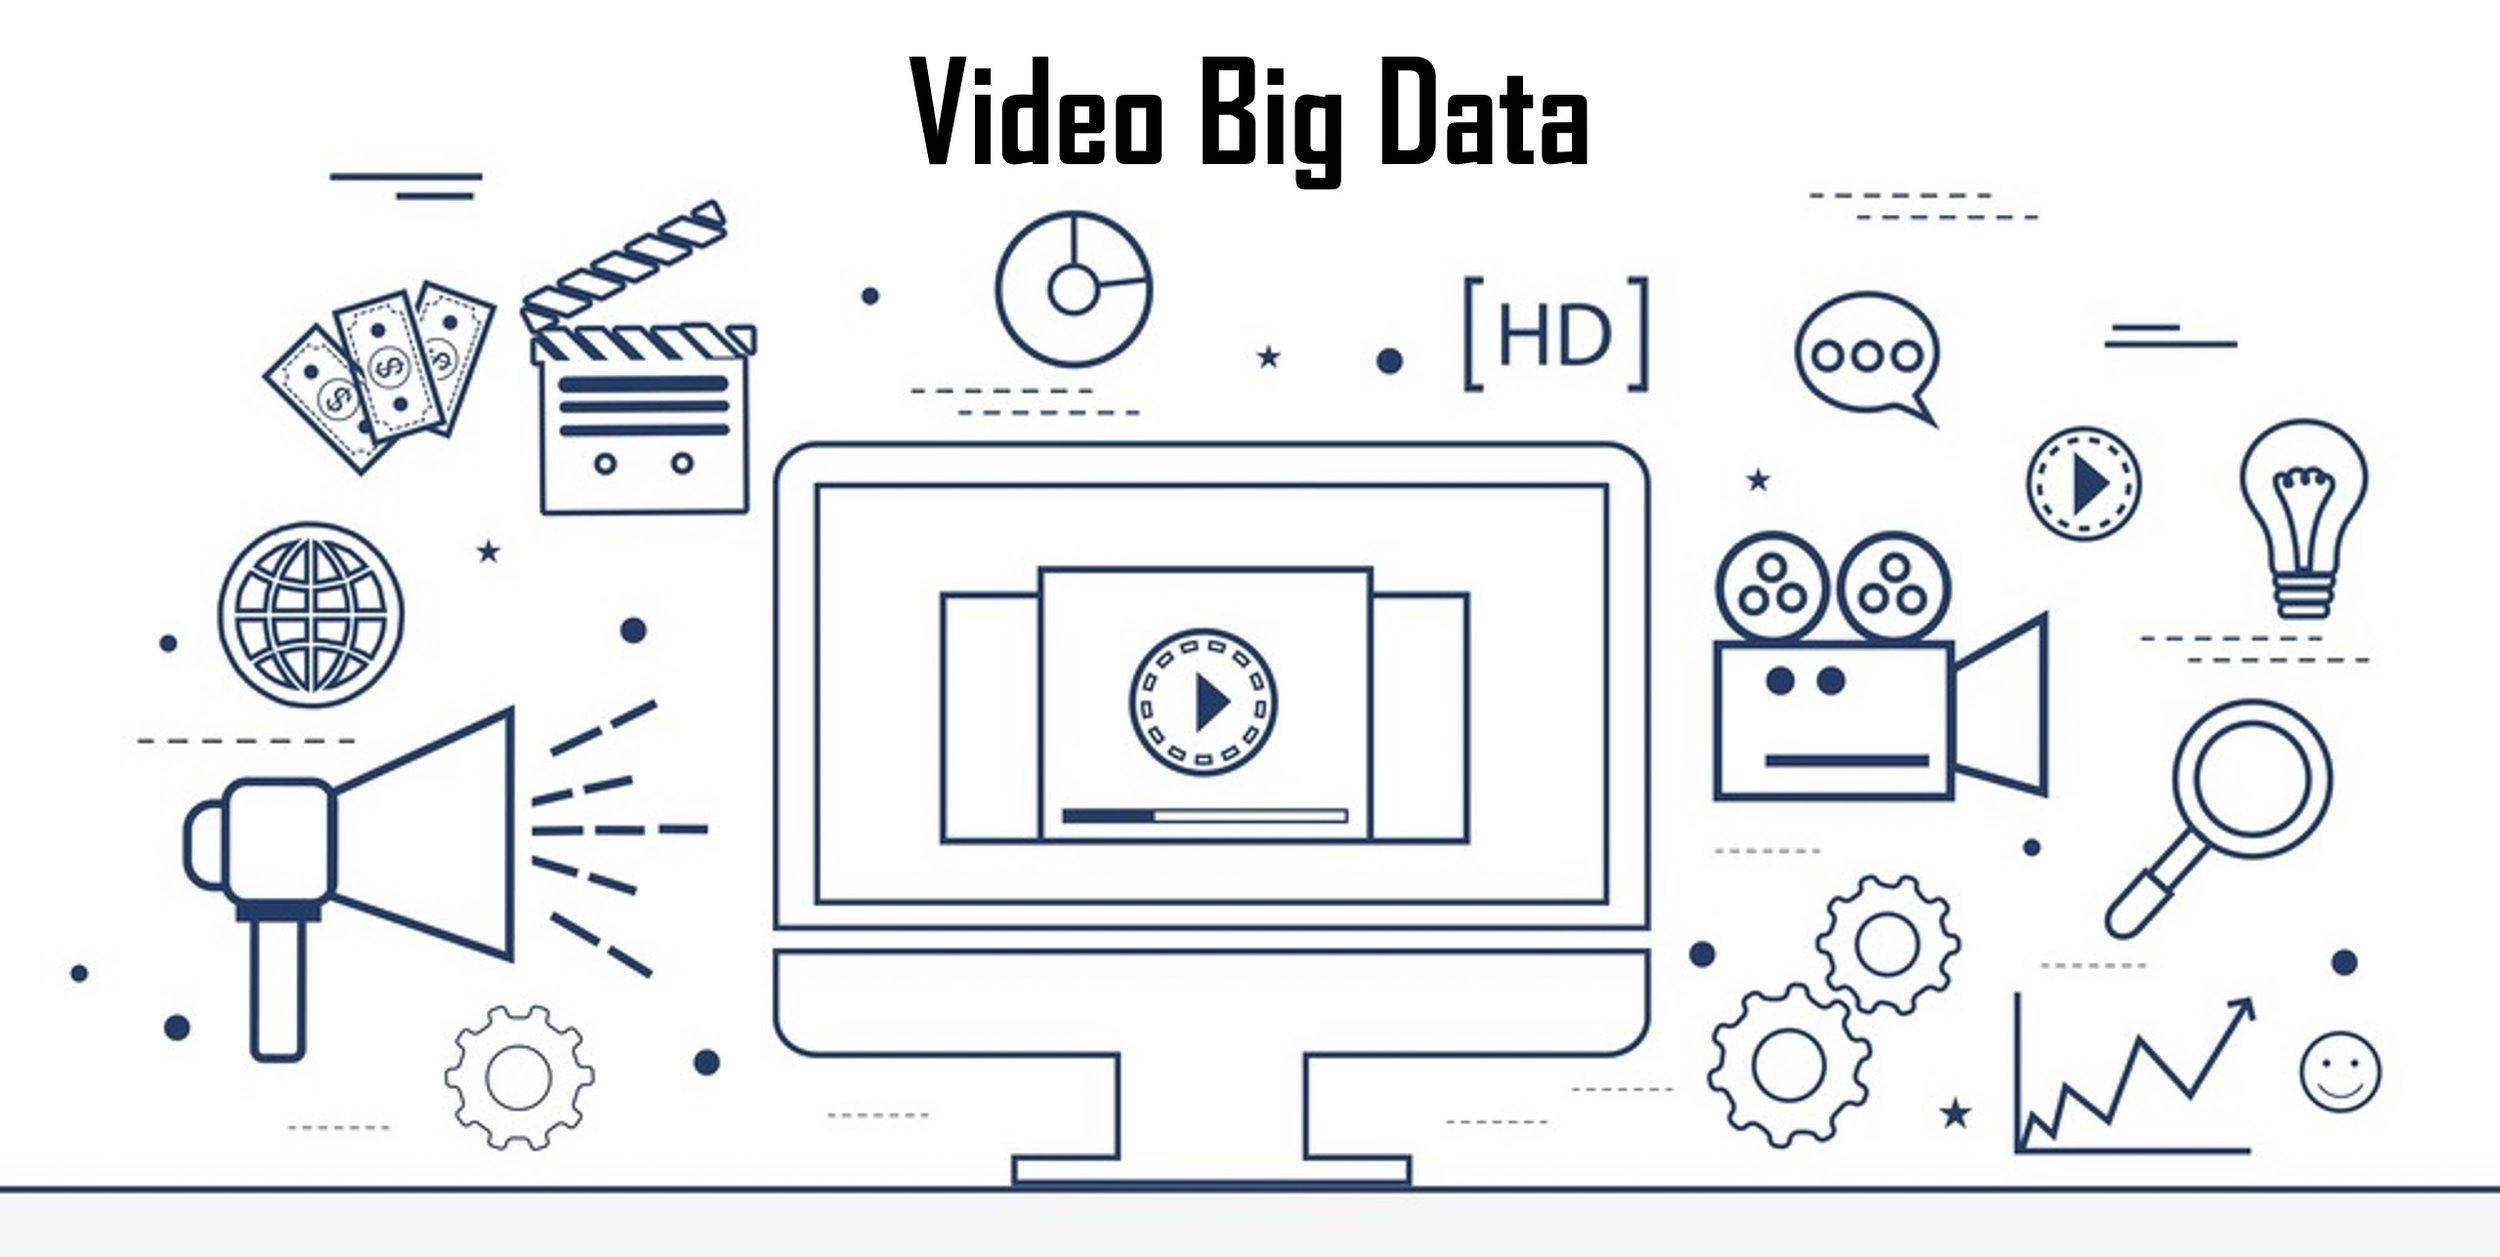 videospace-video-big-data.jpg